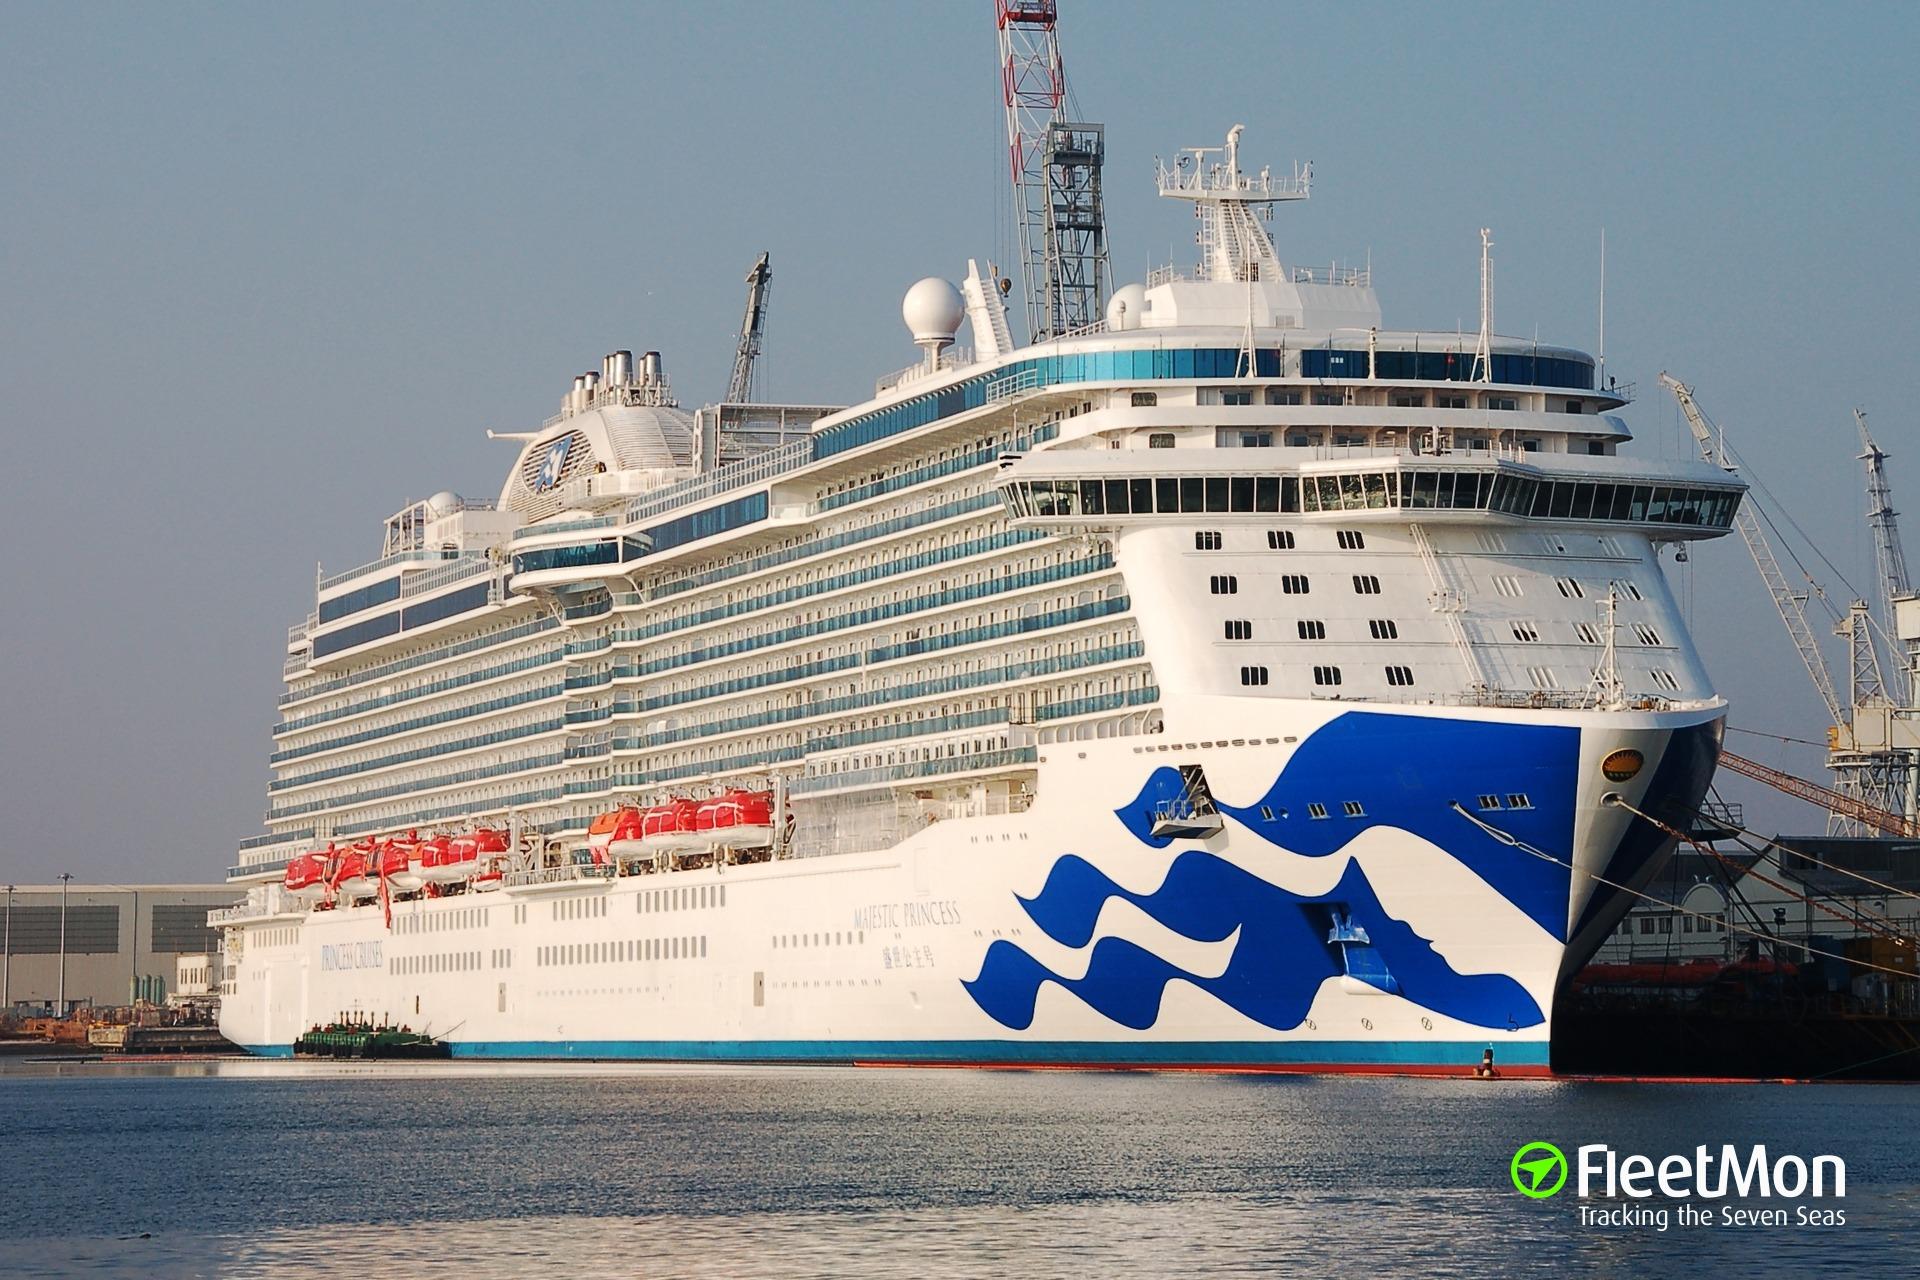 Majestic Princess Passenger Ship Imo 9614141 Princess